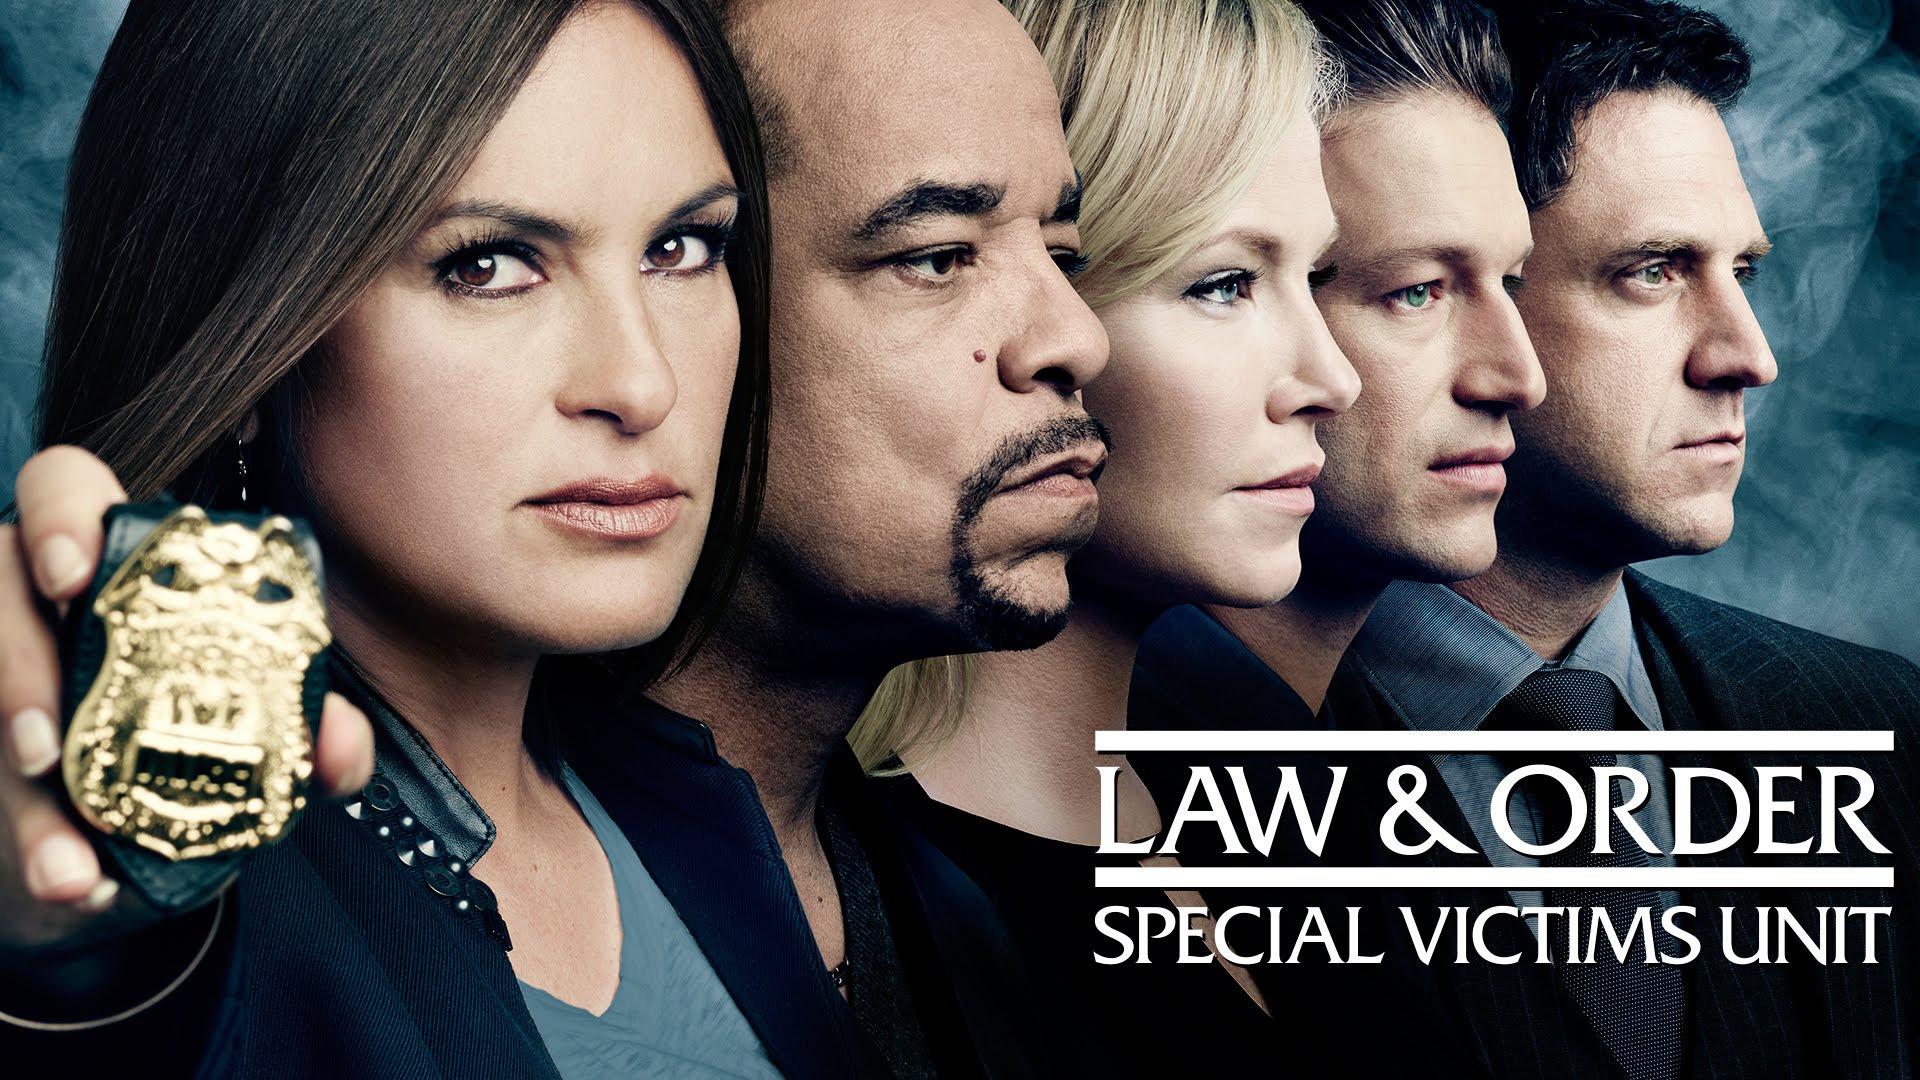 Resultado de imagem para Law & Order: SVU